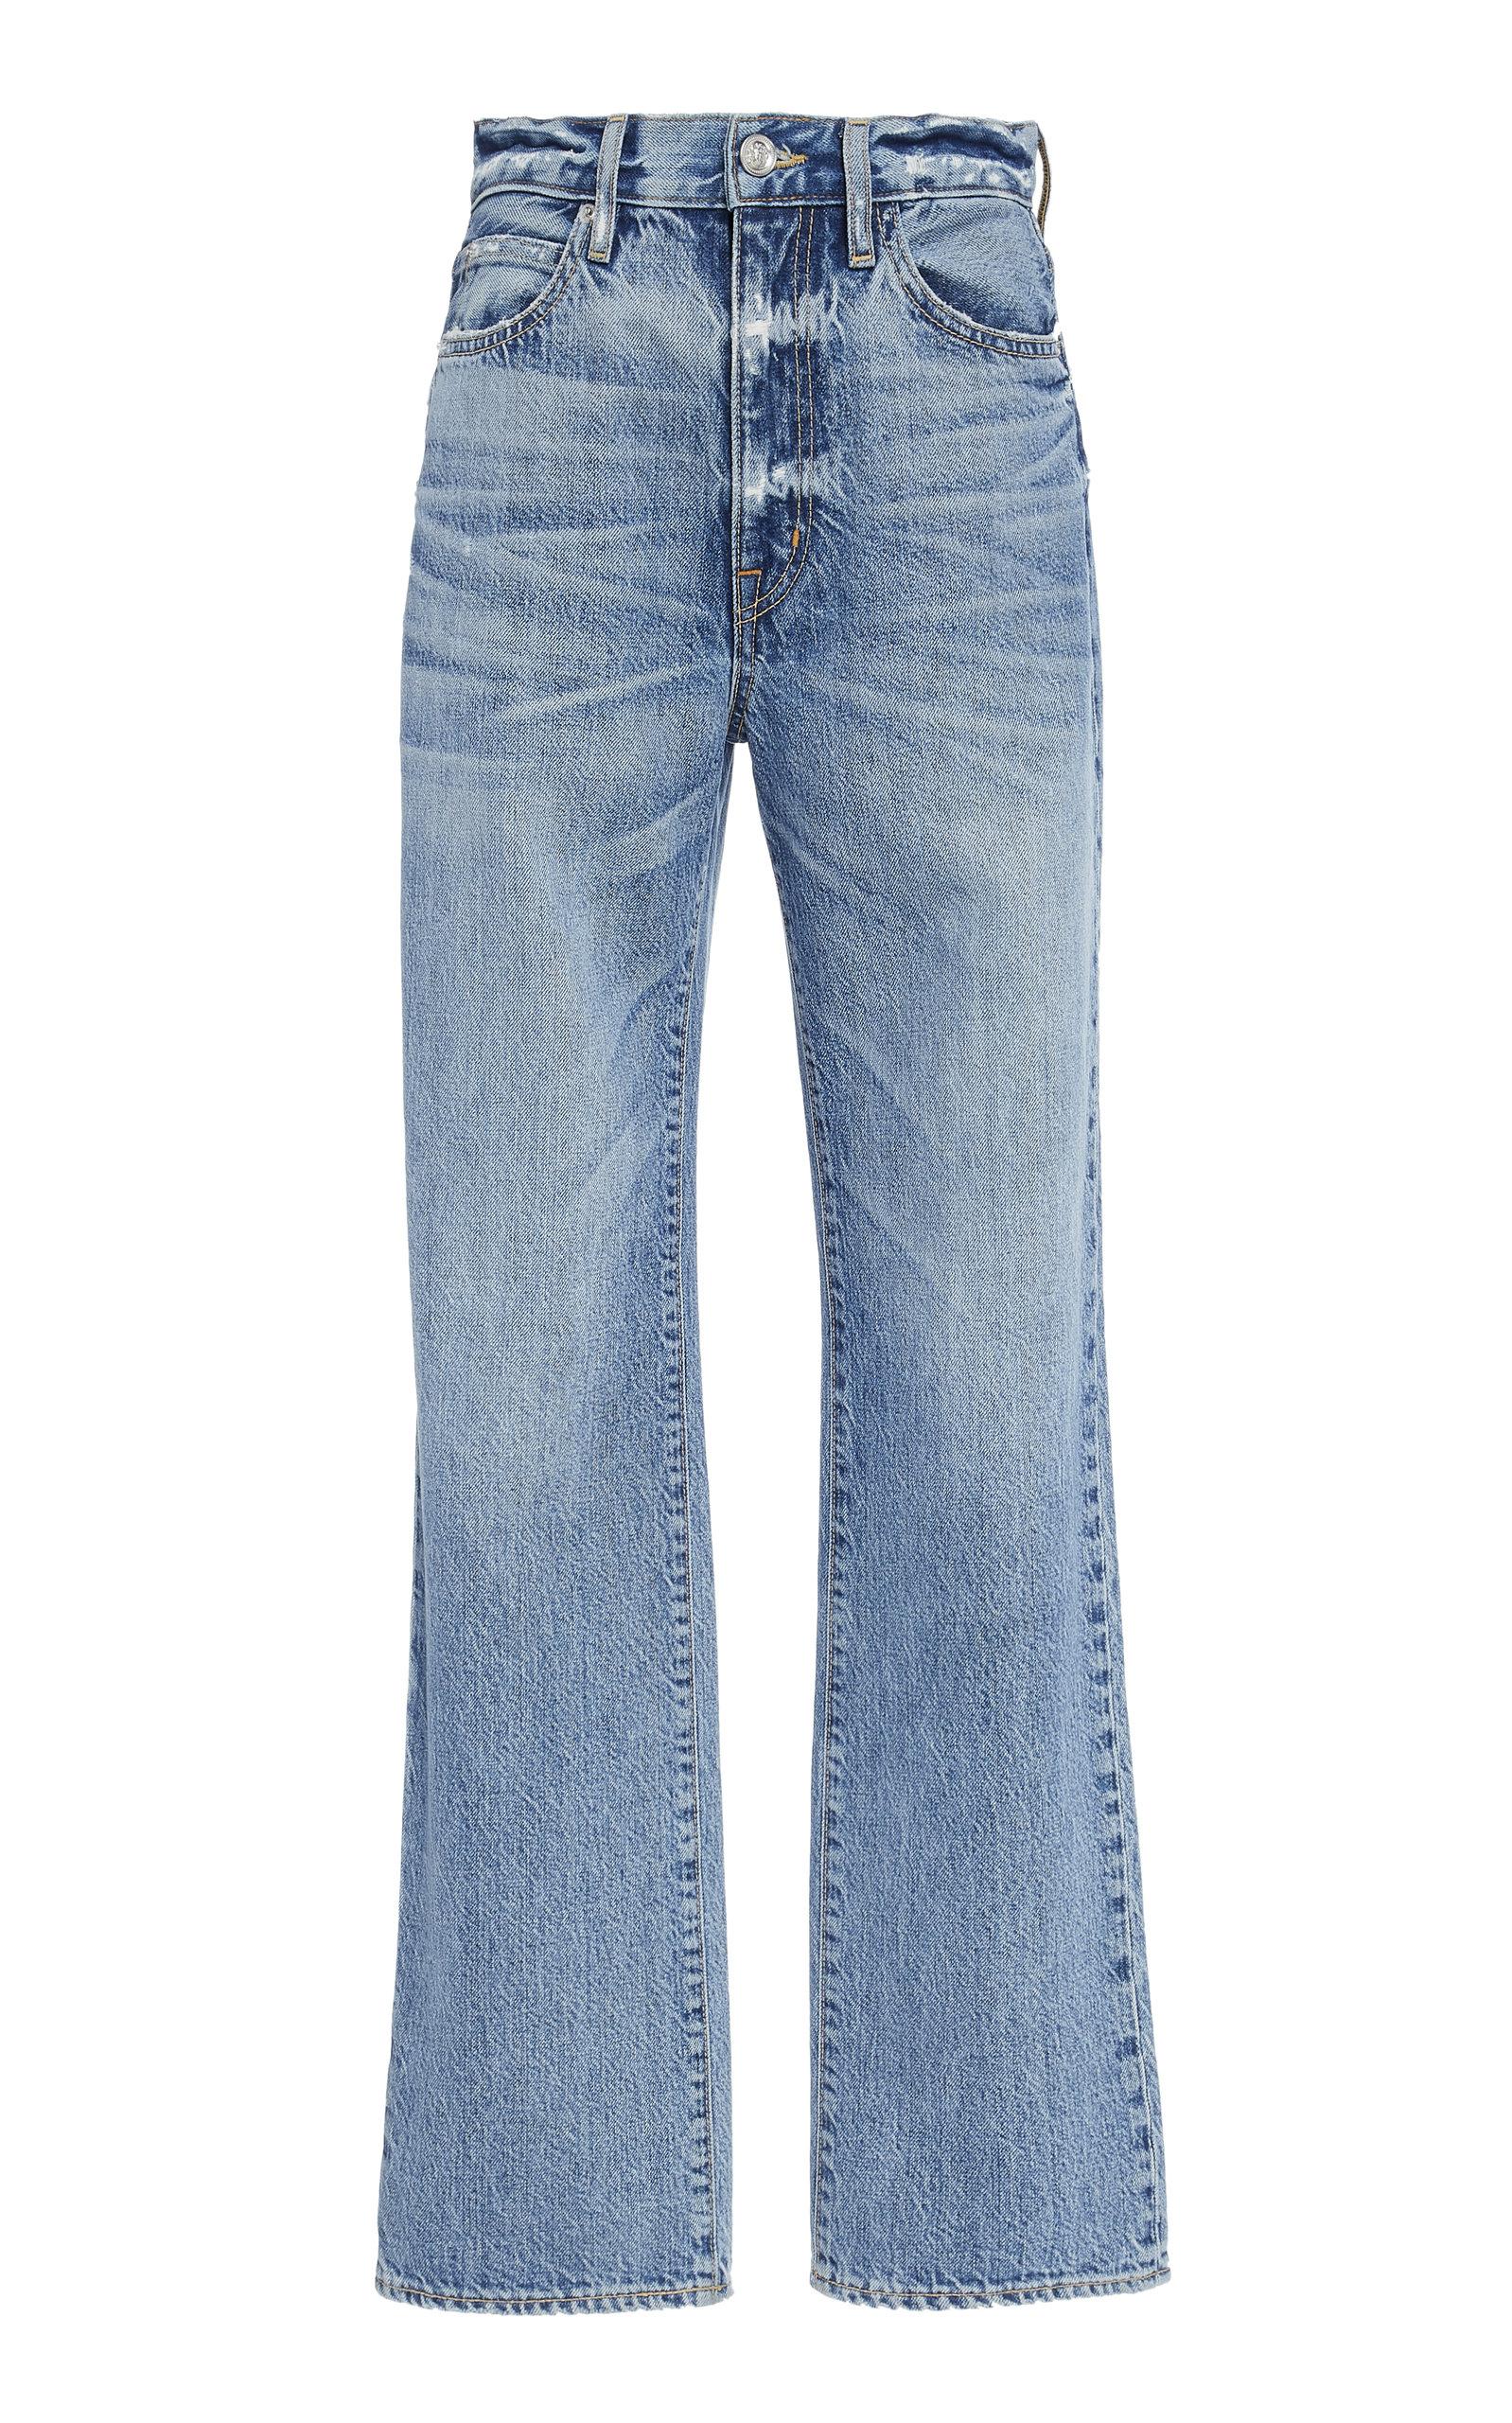 SLVRLAKE DENIM London High-Rise Straight-Leg Jeans in Medium Wash